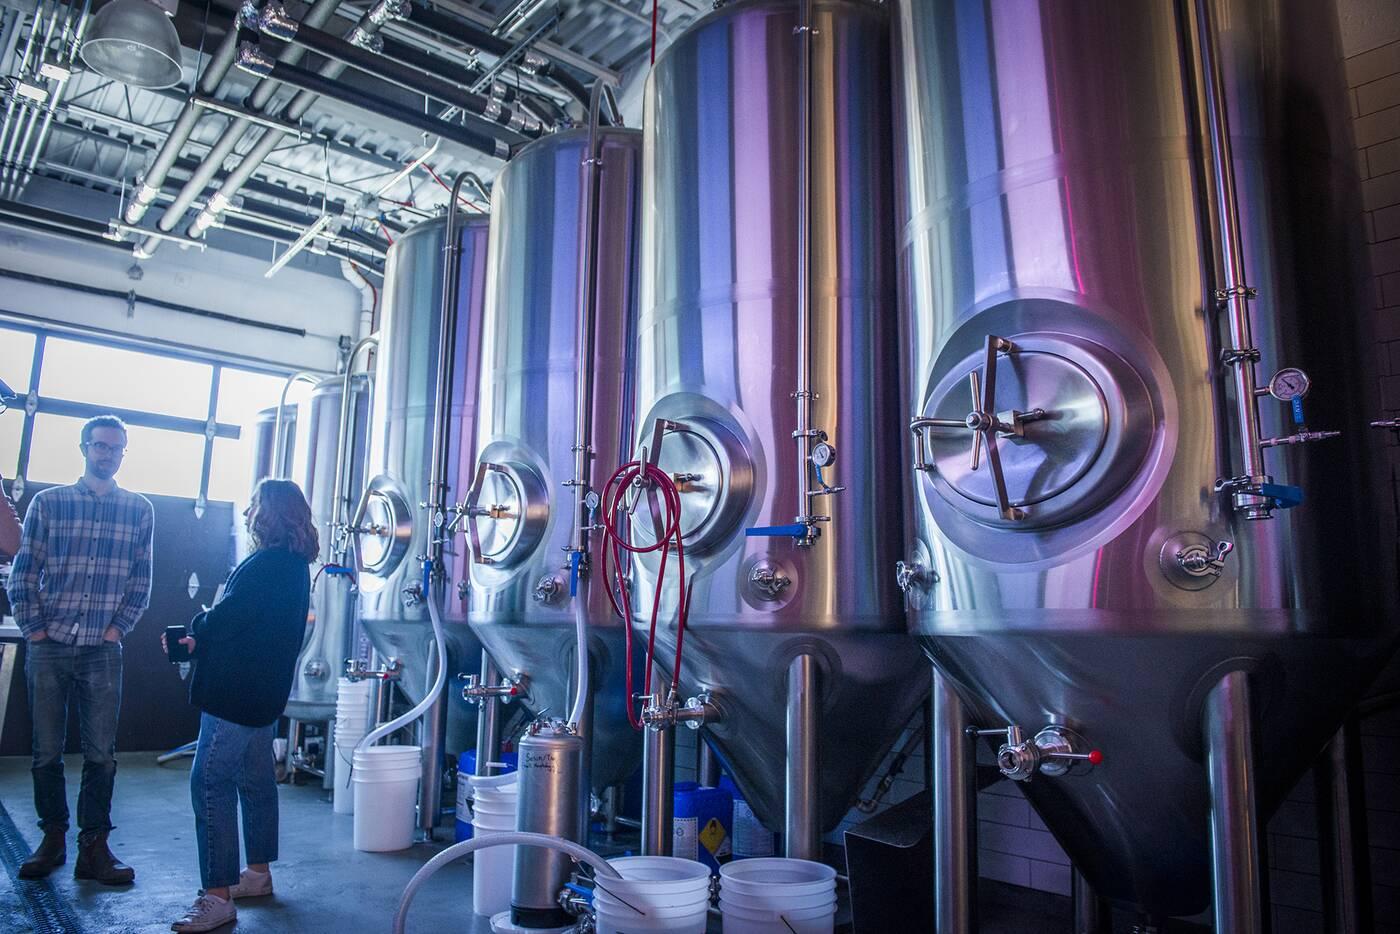 Halo Brewery Toronto